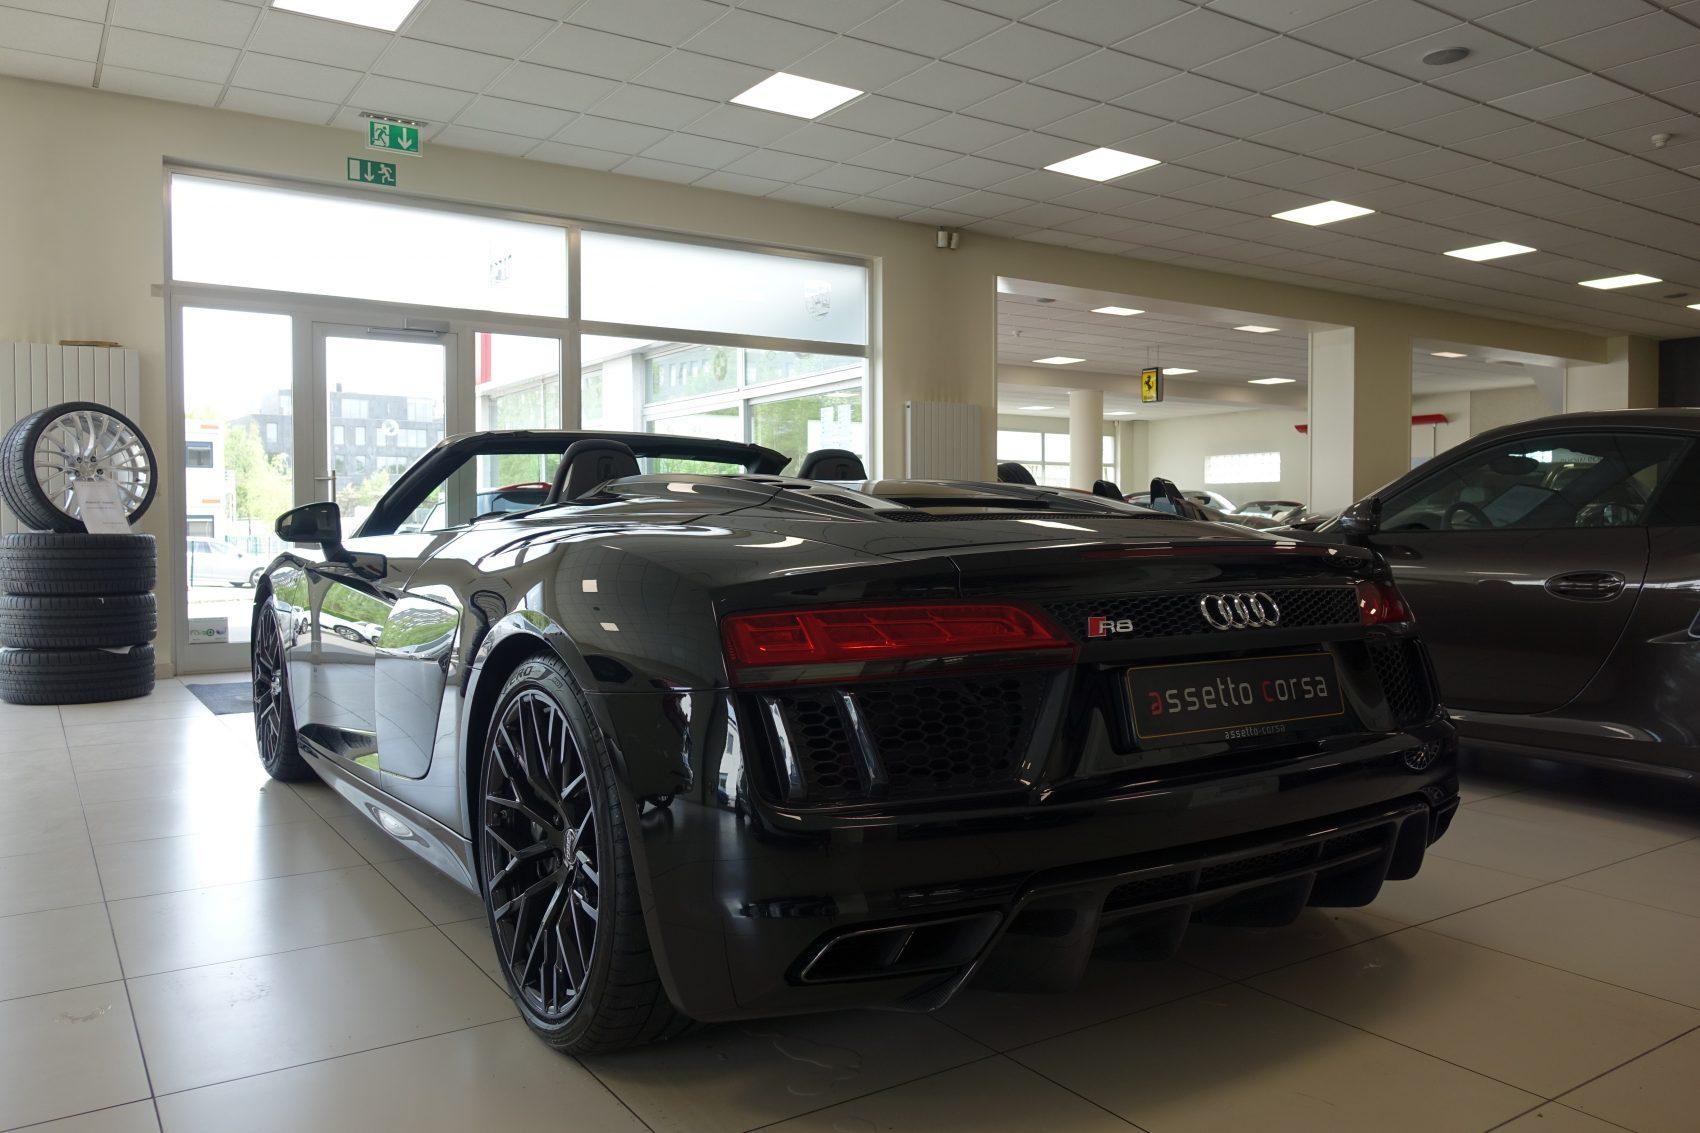 Audi R8 Spyder Assetto Corsa